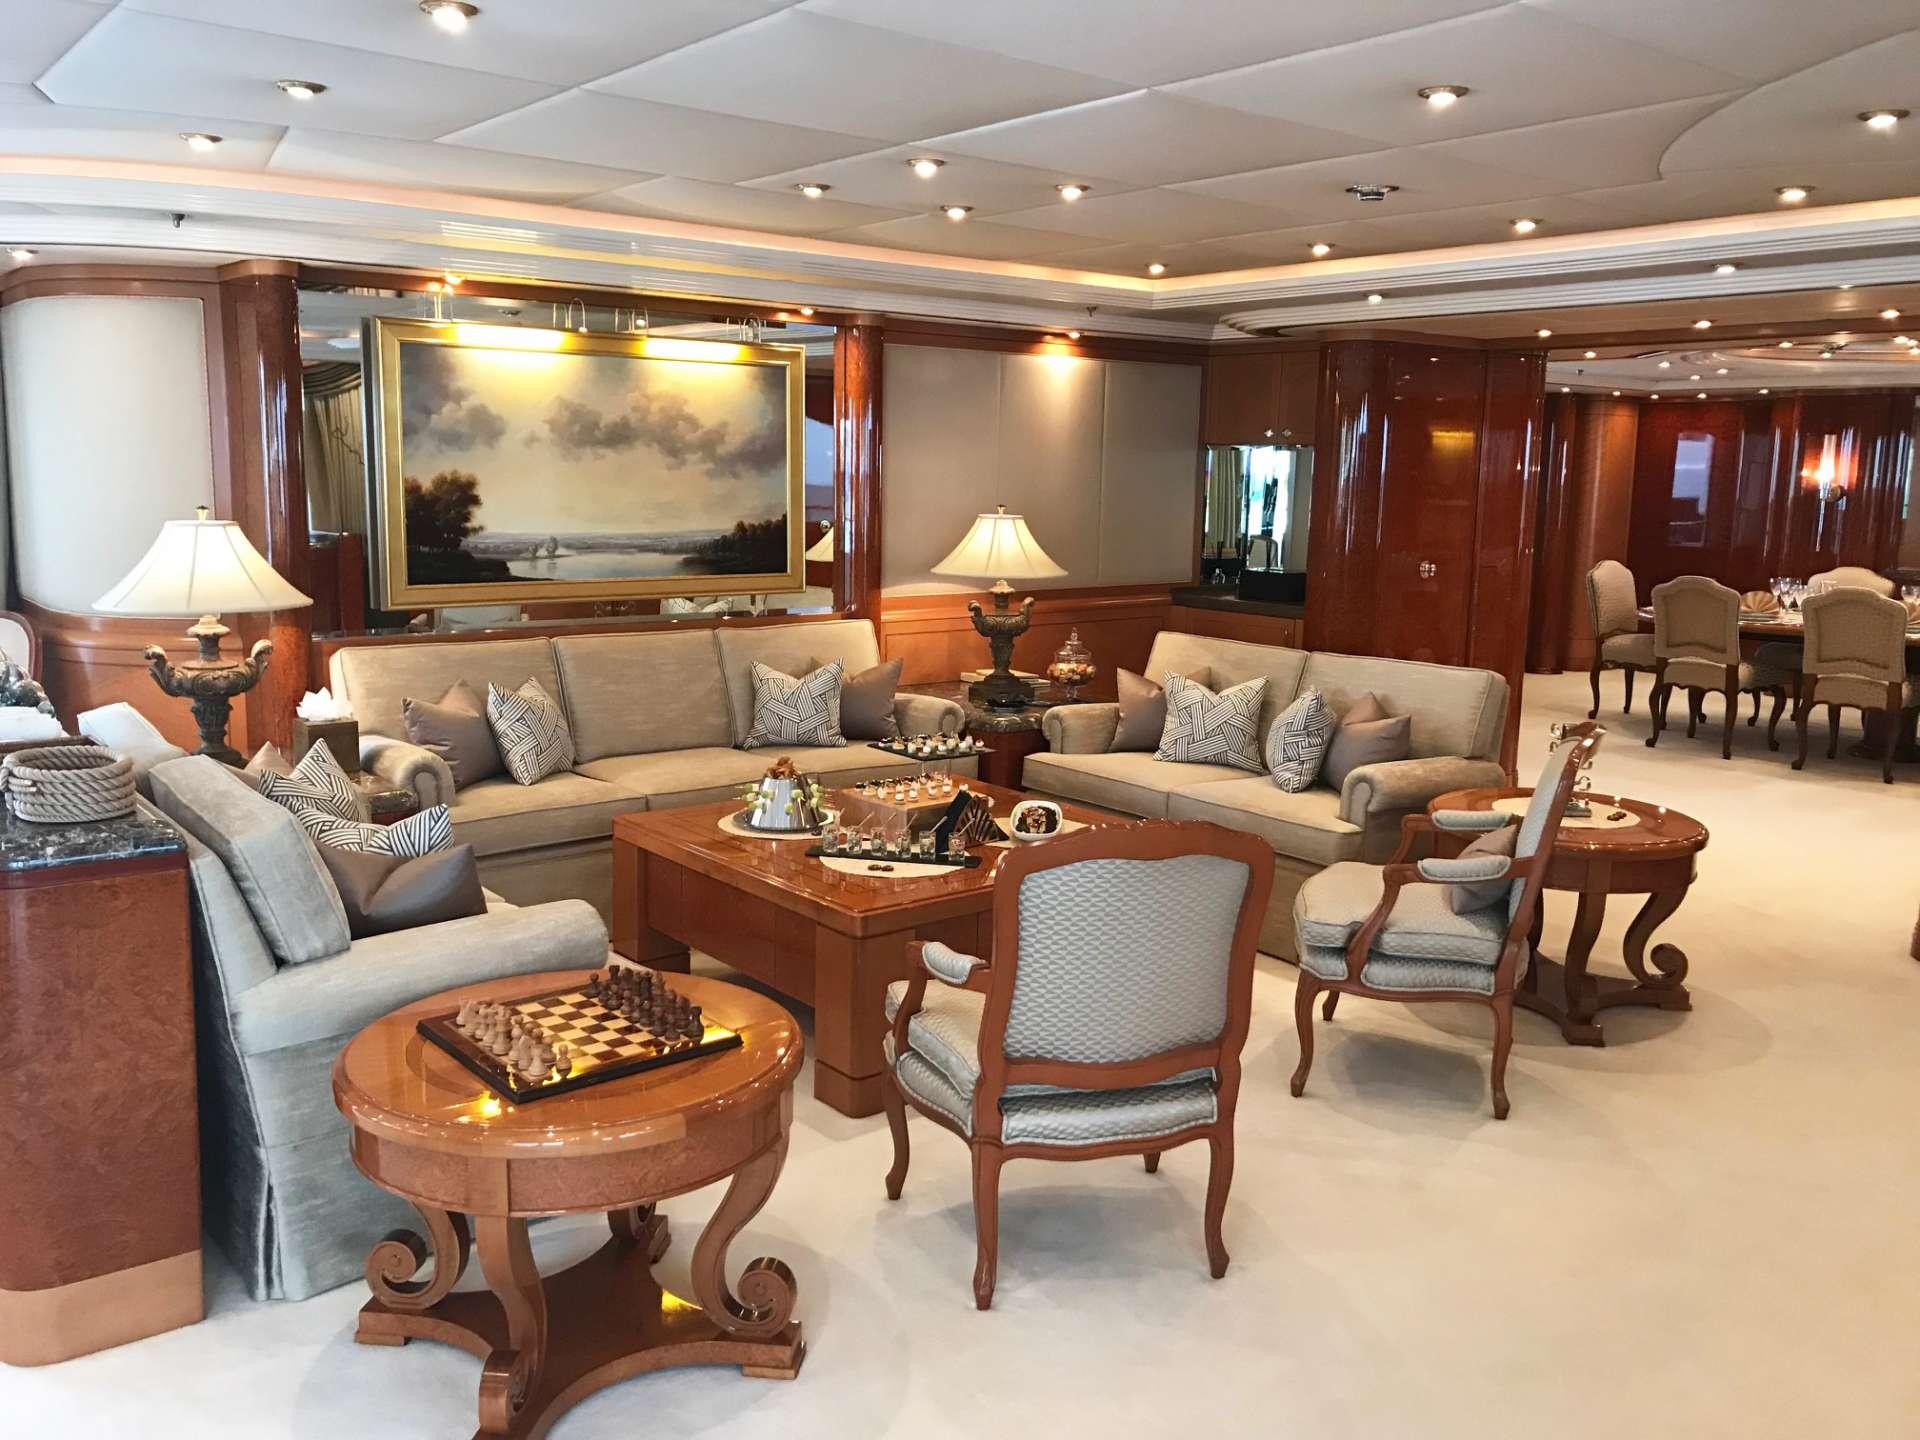 Power Yacht 'Power', 12 PAX, 15 Crew, 192.00 Ft, 58.00 Meters, Built 2003, Lurssen, Refit Year